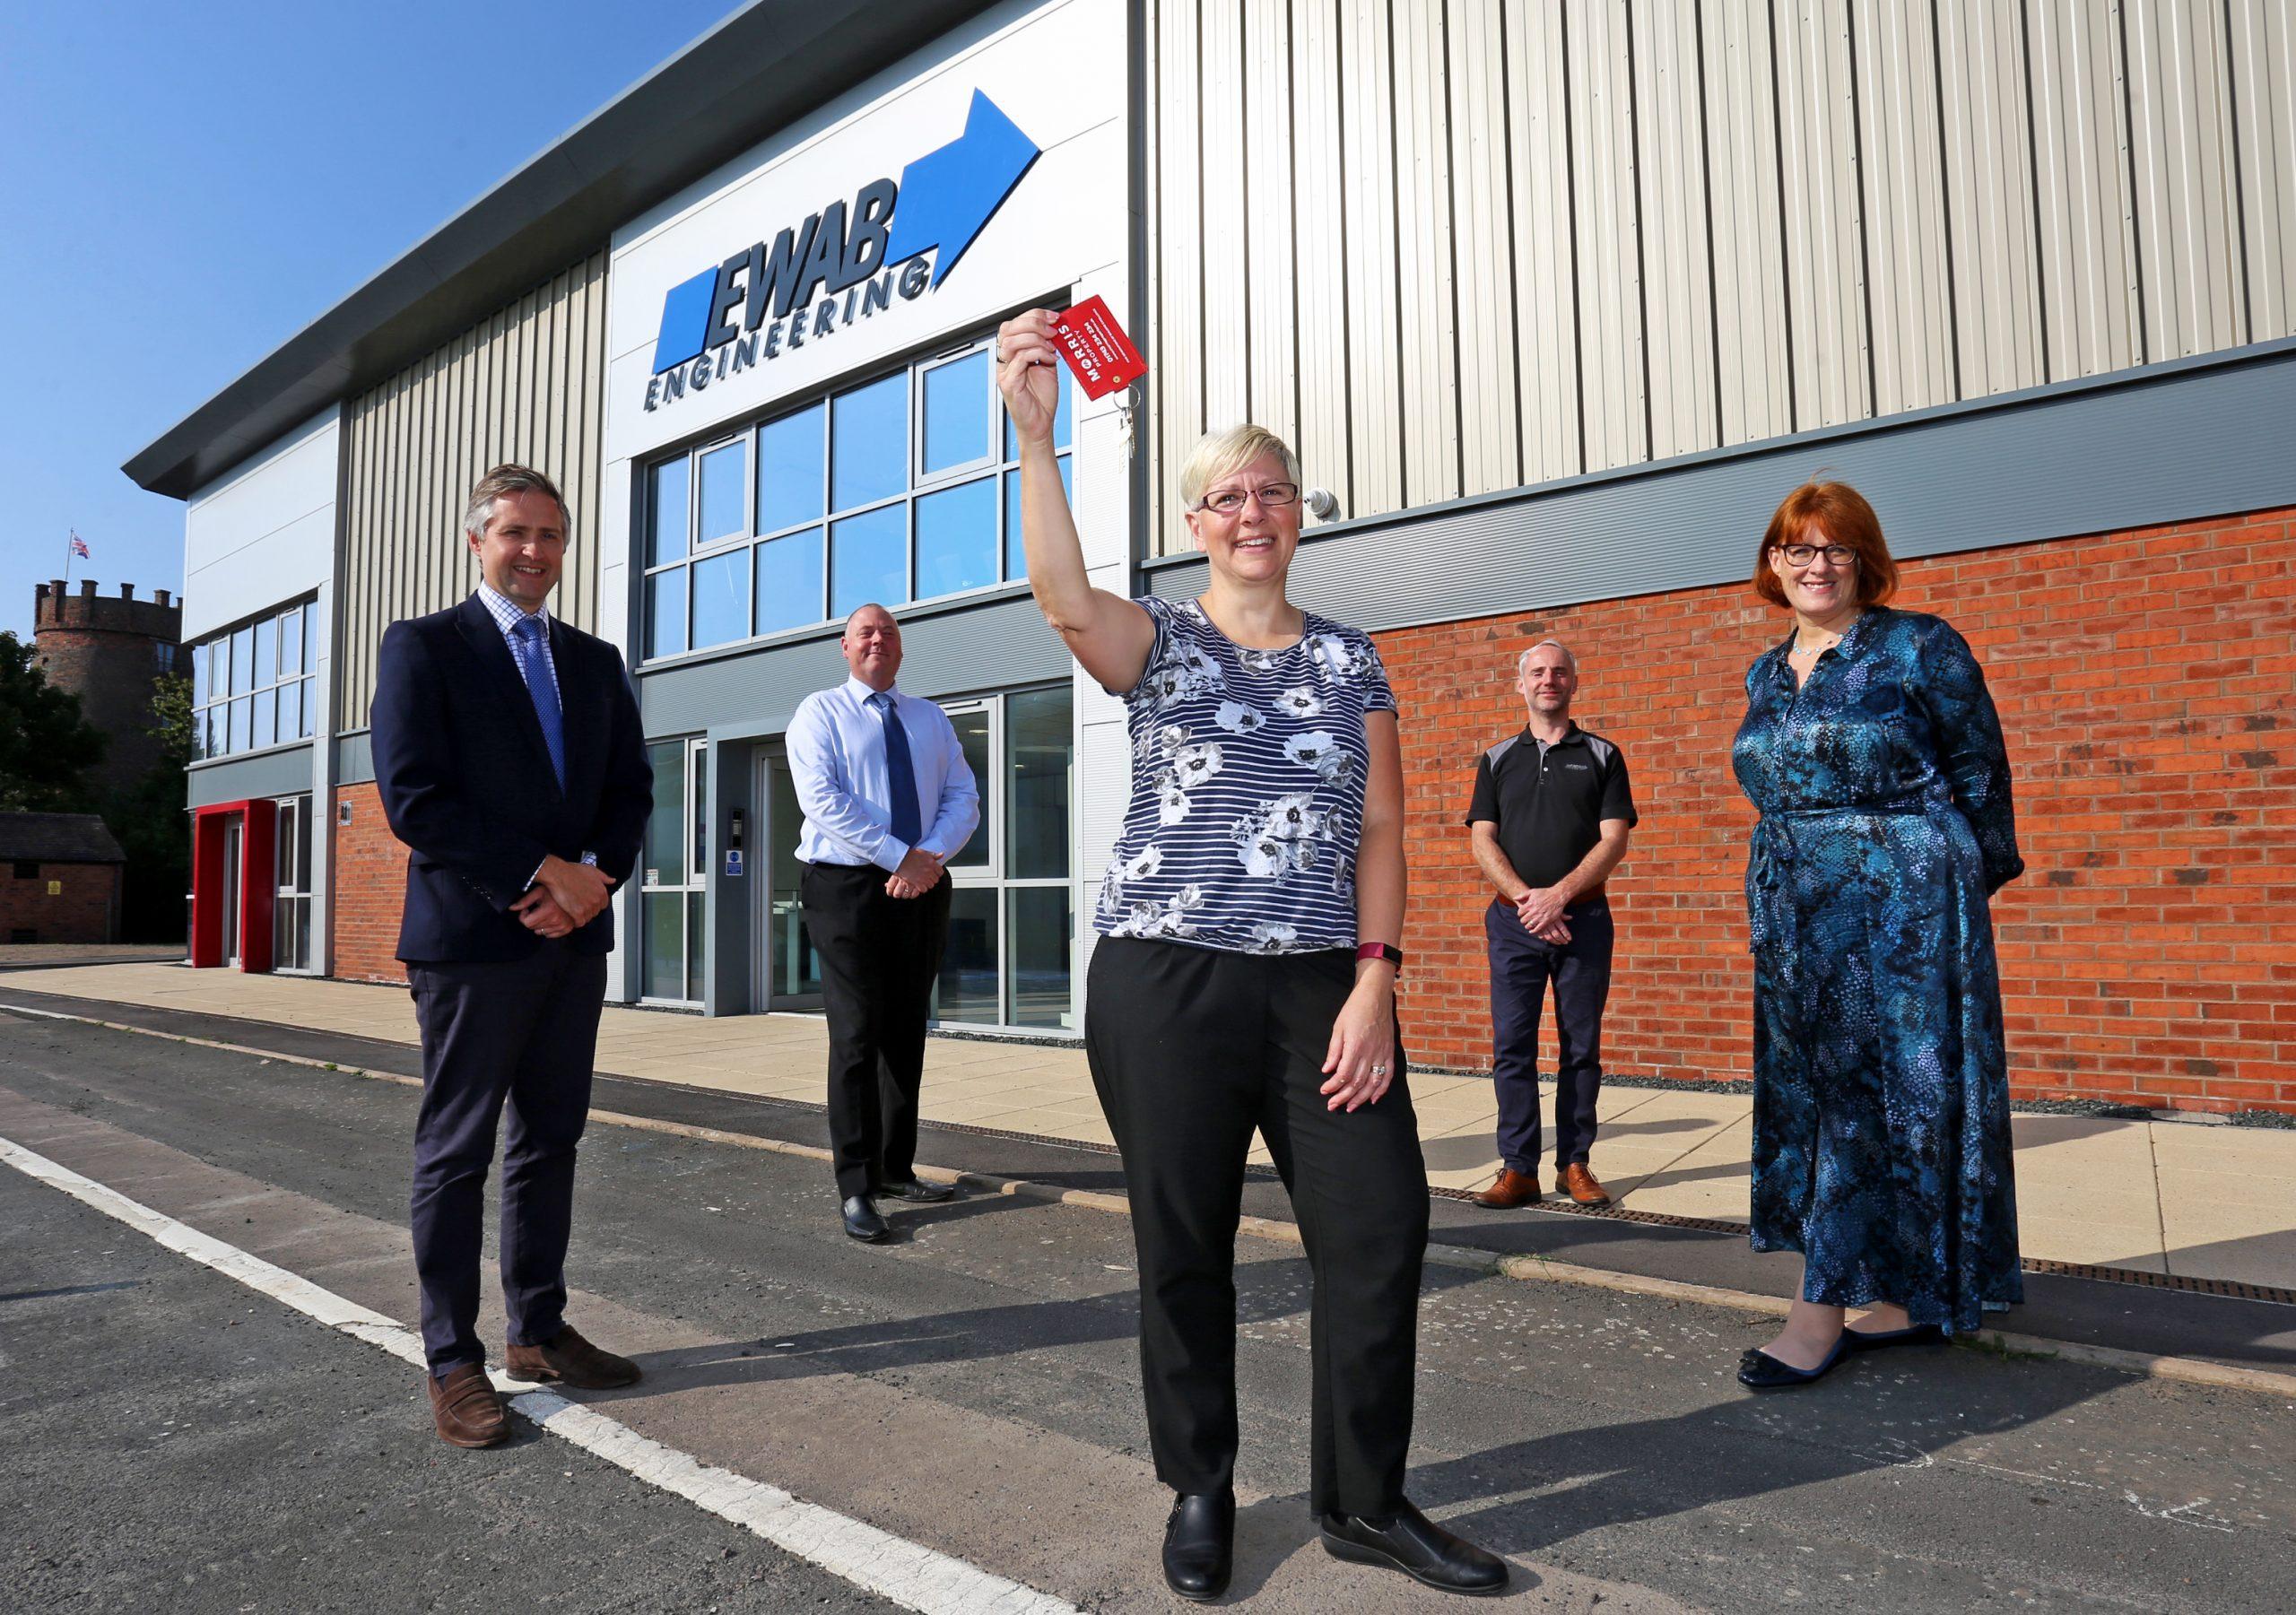 Ewab Engineering at Access442, Telford